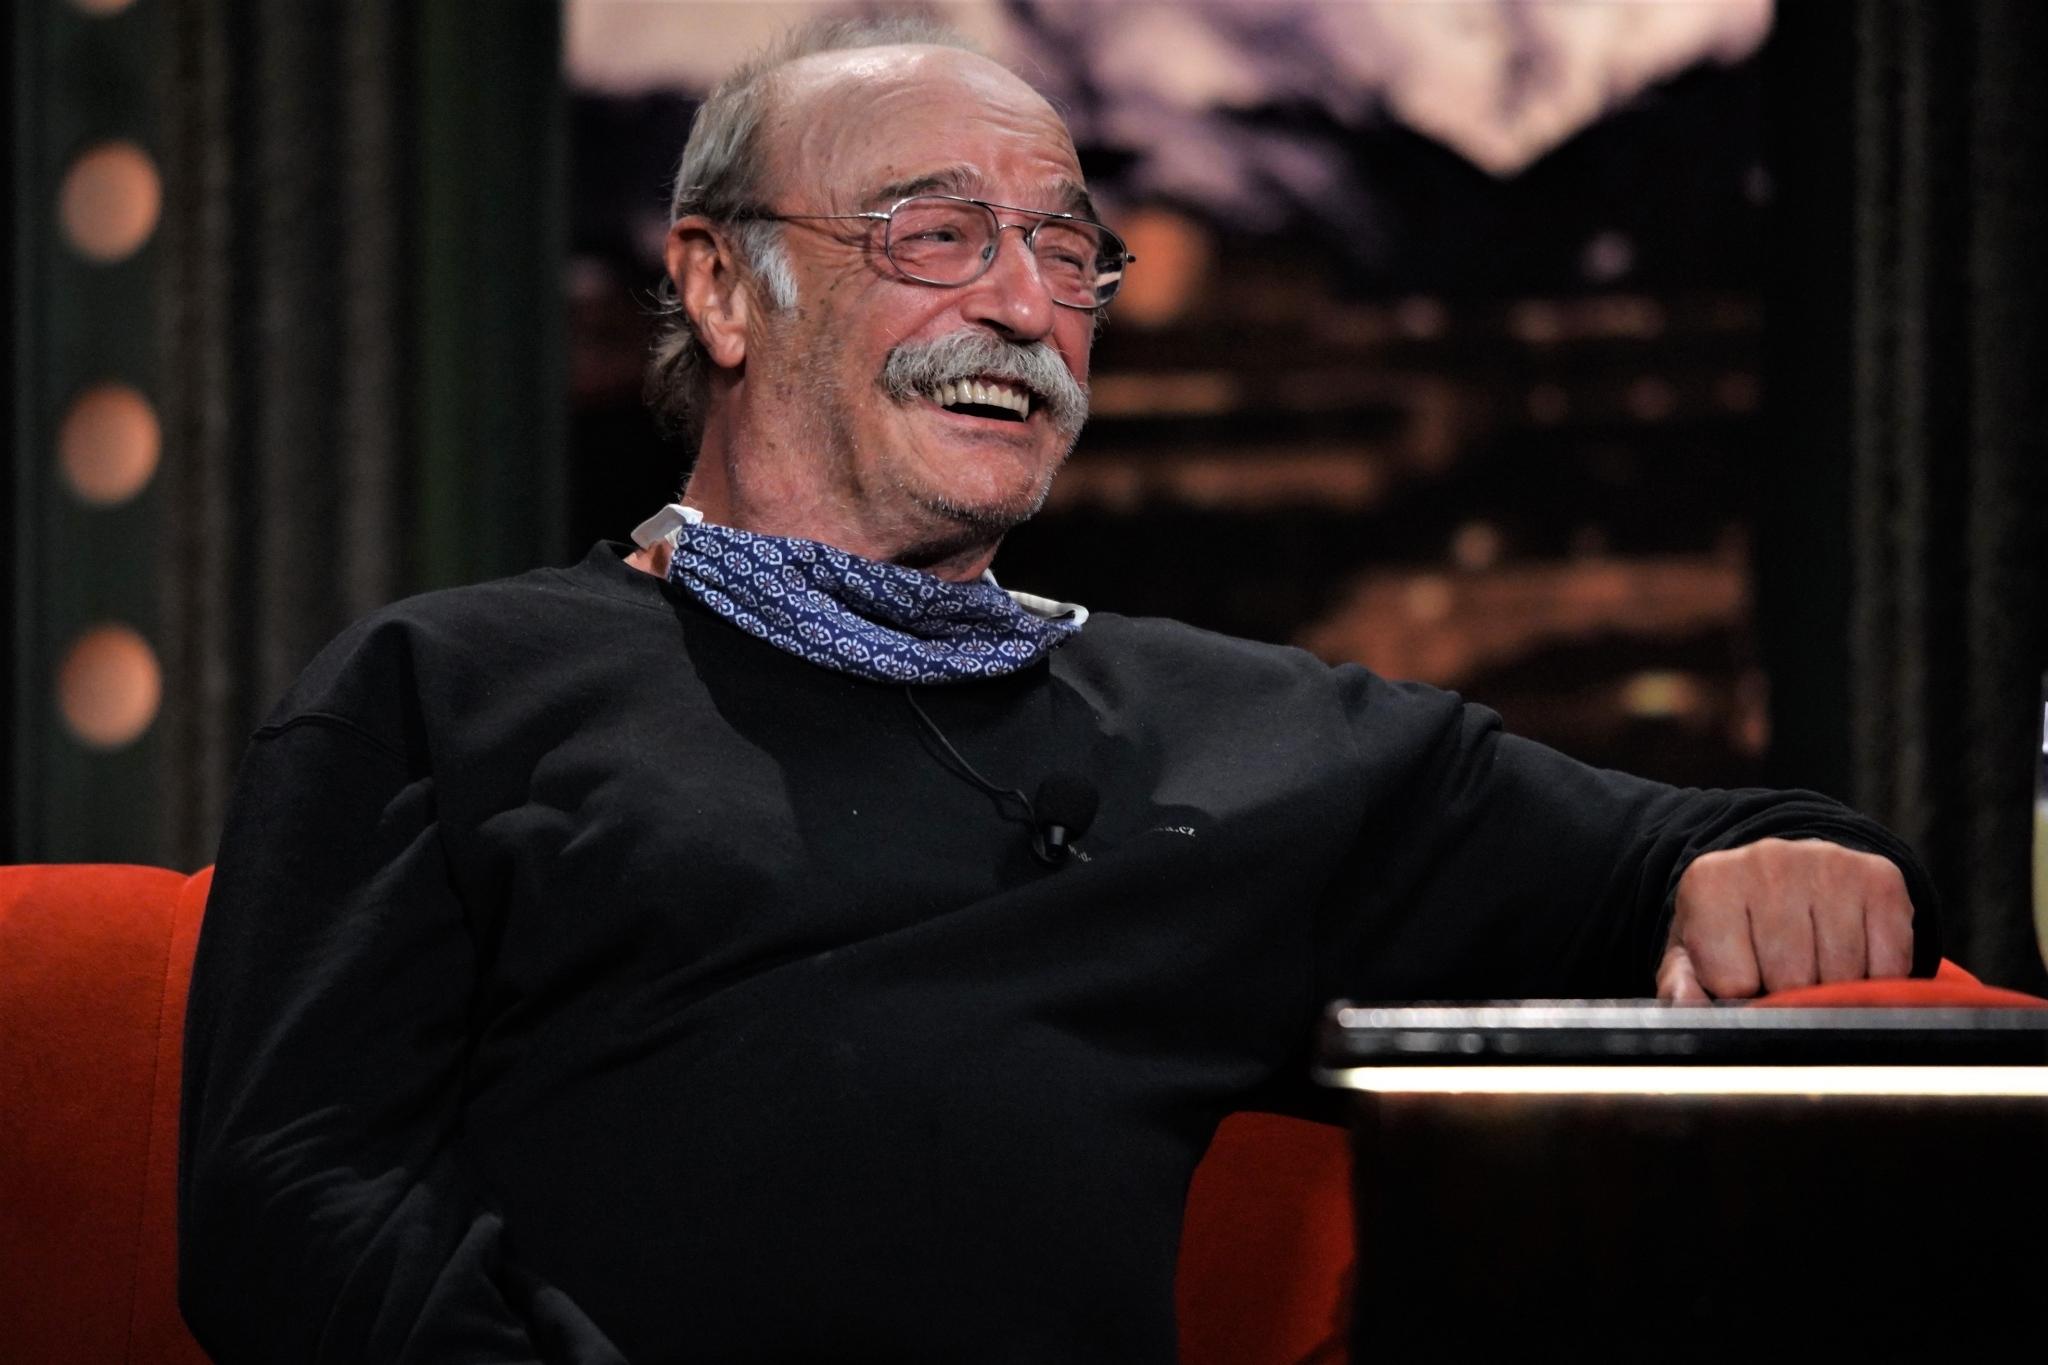 Pavel Nový, herec, v SJK 23. 9. 2020